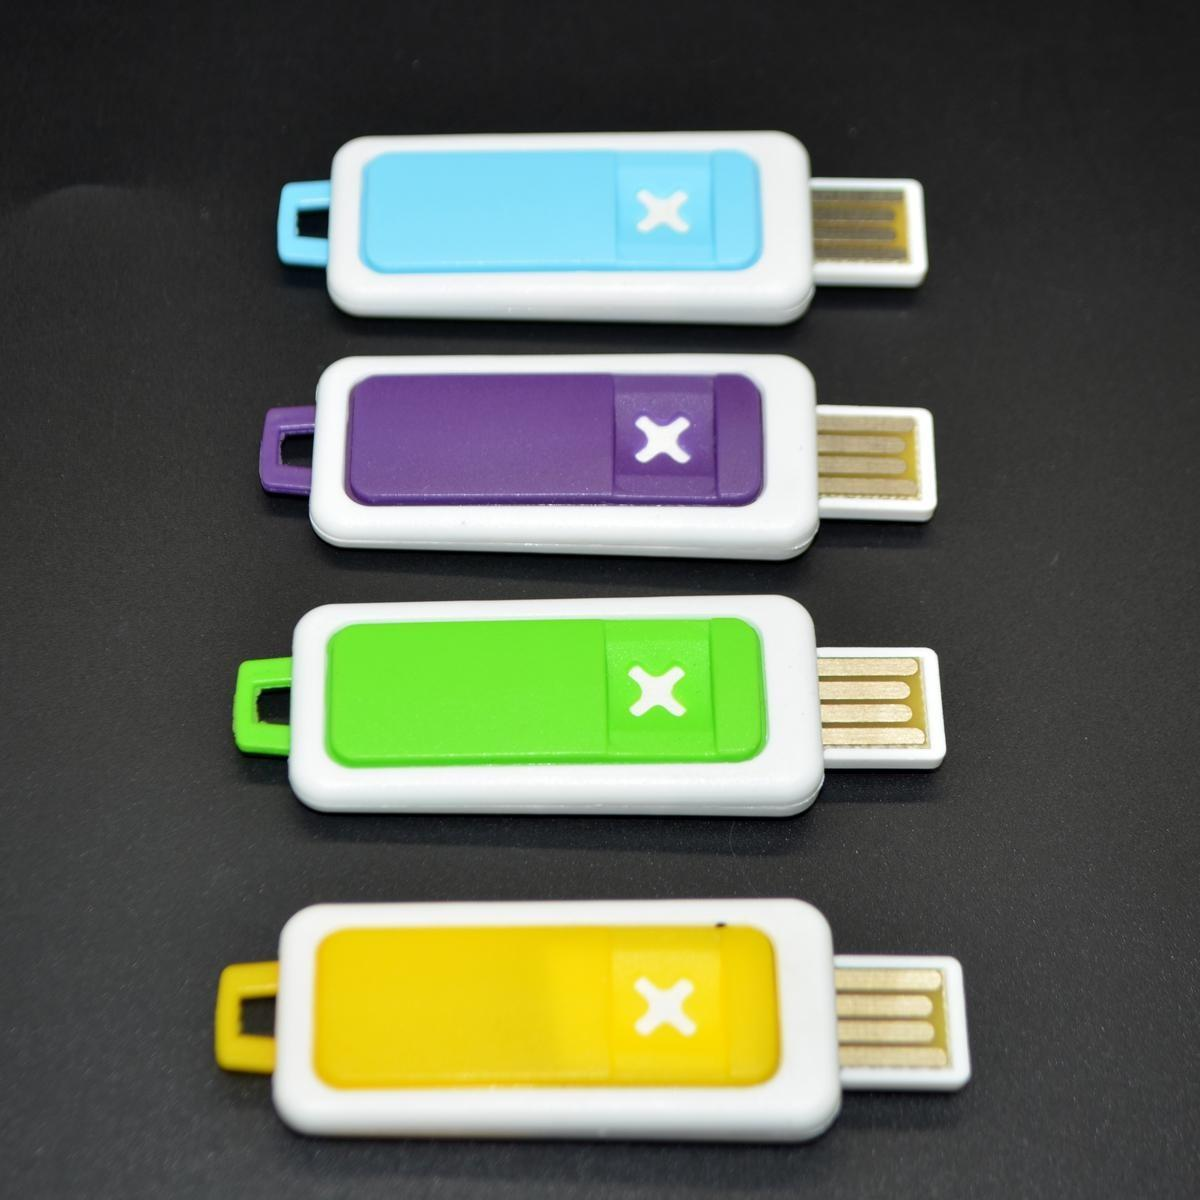 10 unids / lote Mini Home Office Ordenador USB Aroma Difusor Coche Fragancia SPA Aromaterapia Purificador de Aire Ambientador Humidificador Sin Aceite